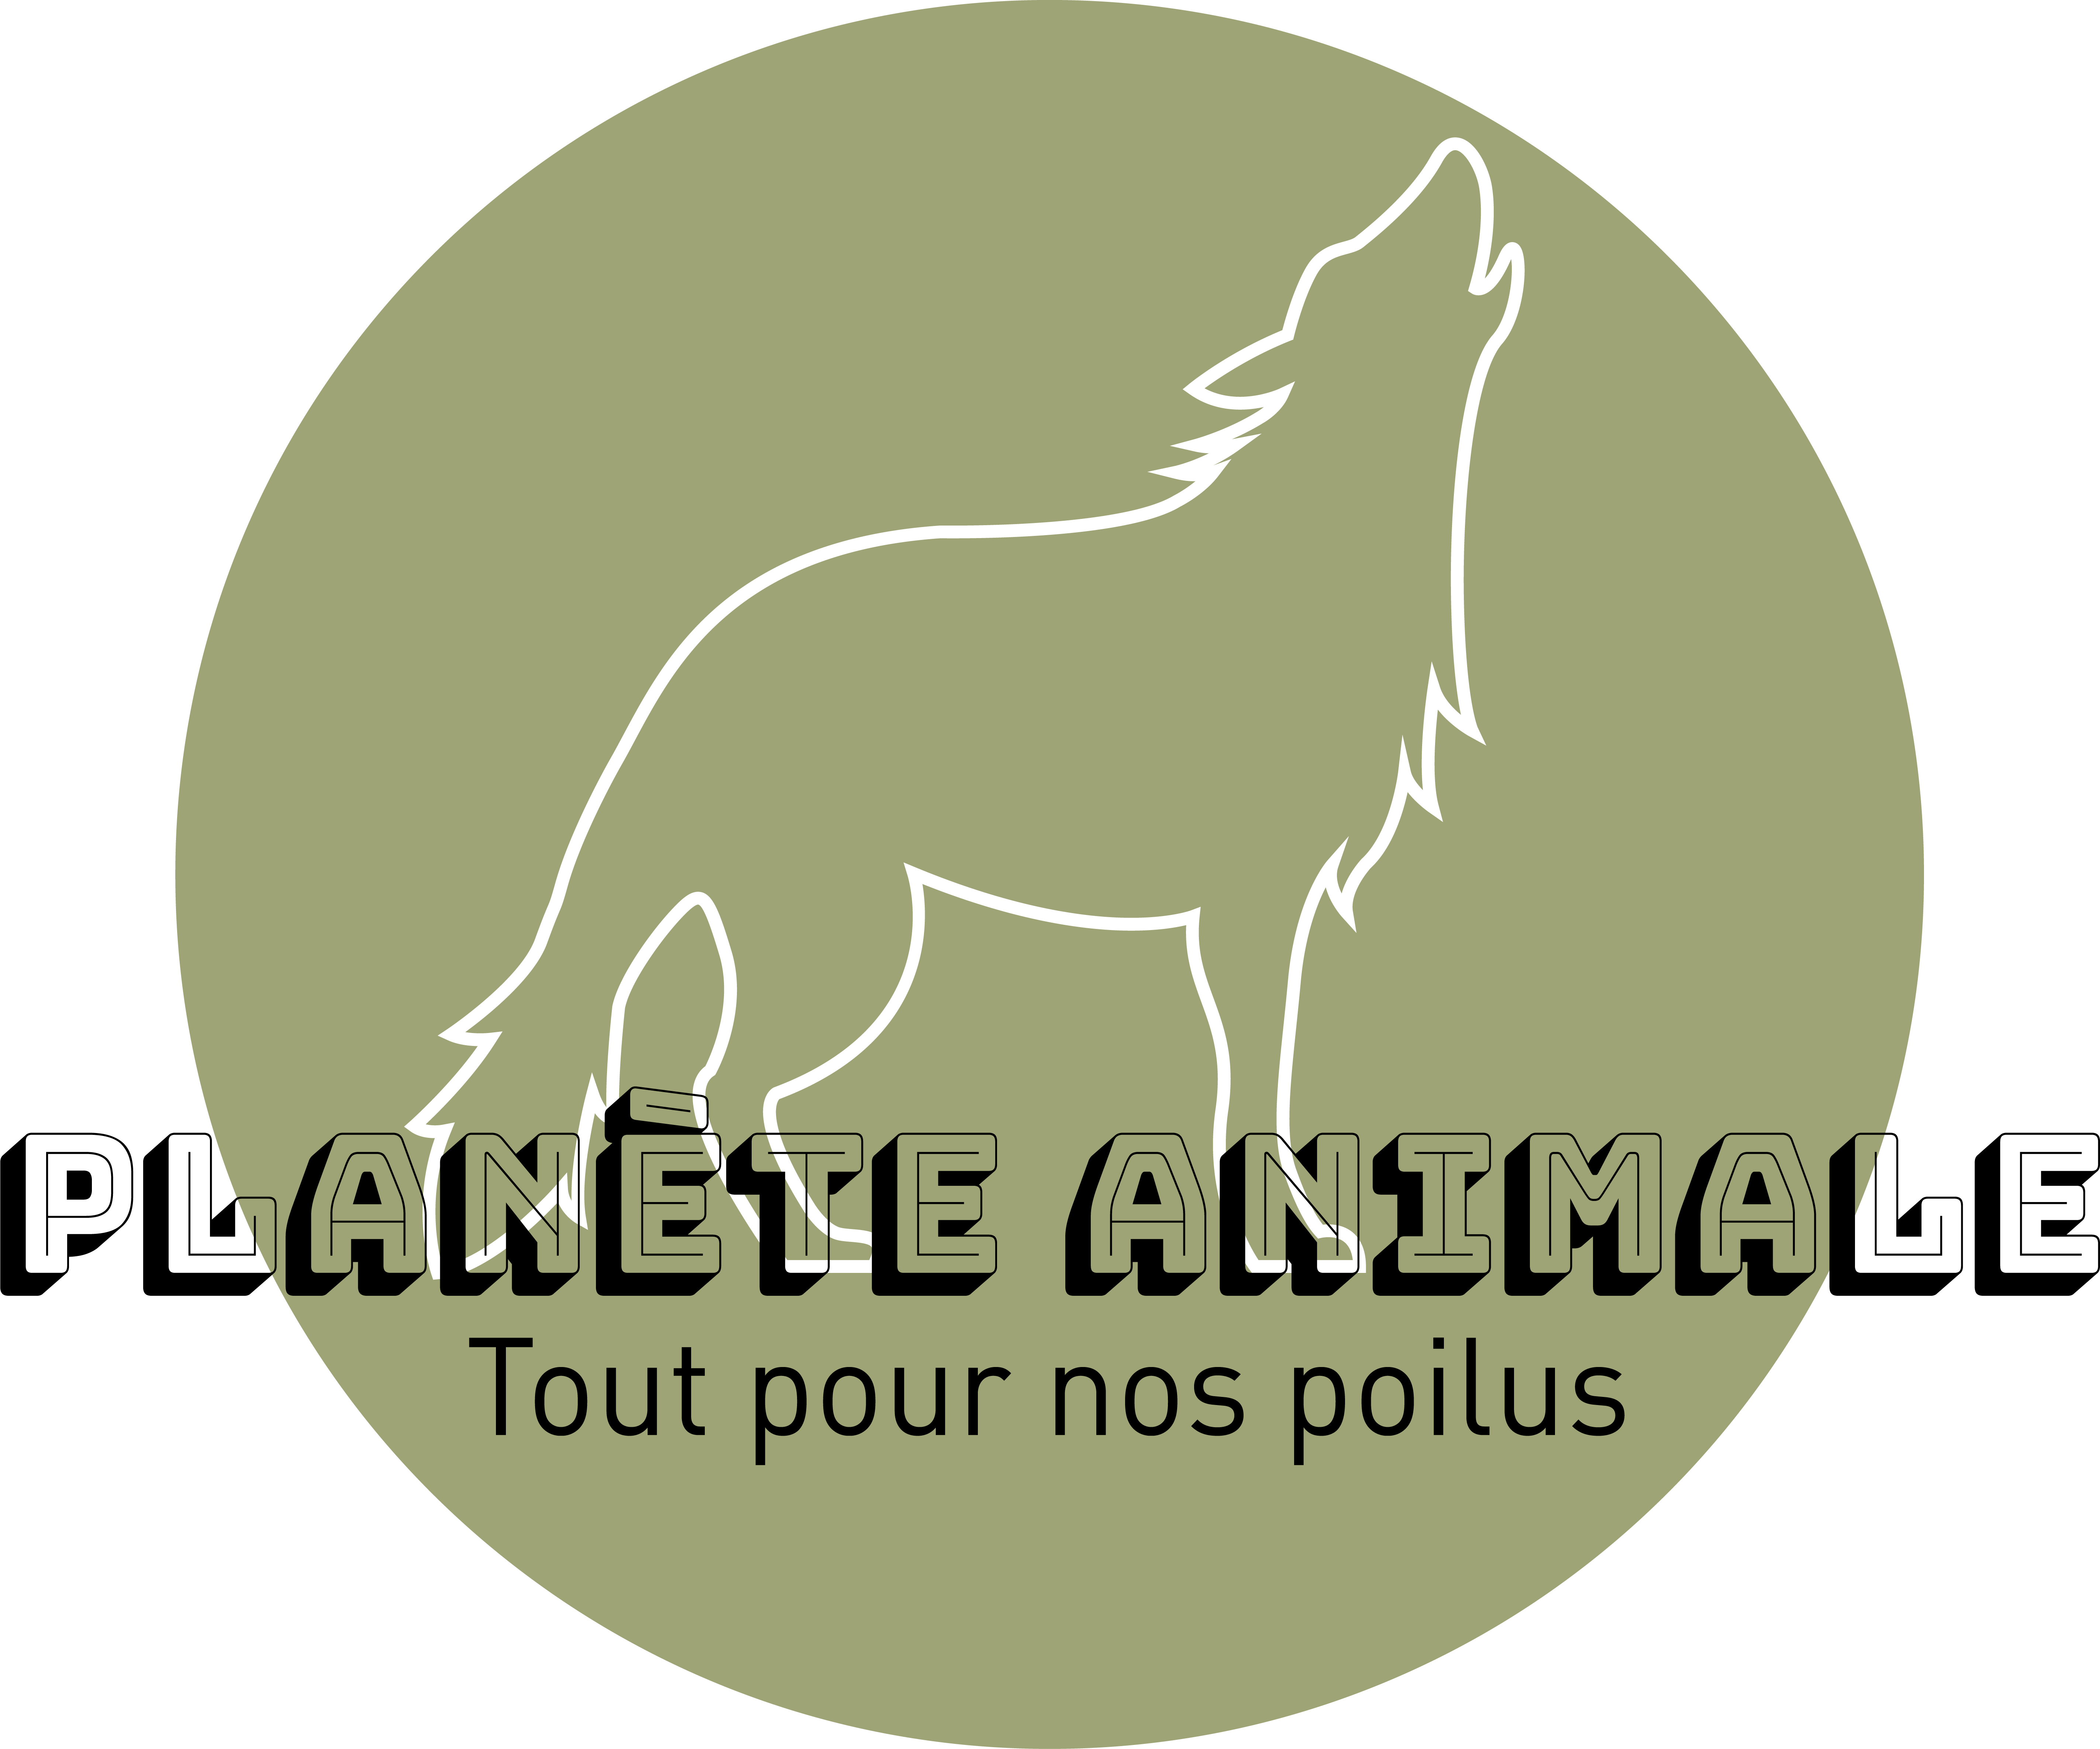 PLANETE ANIMALE